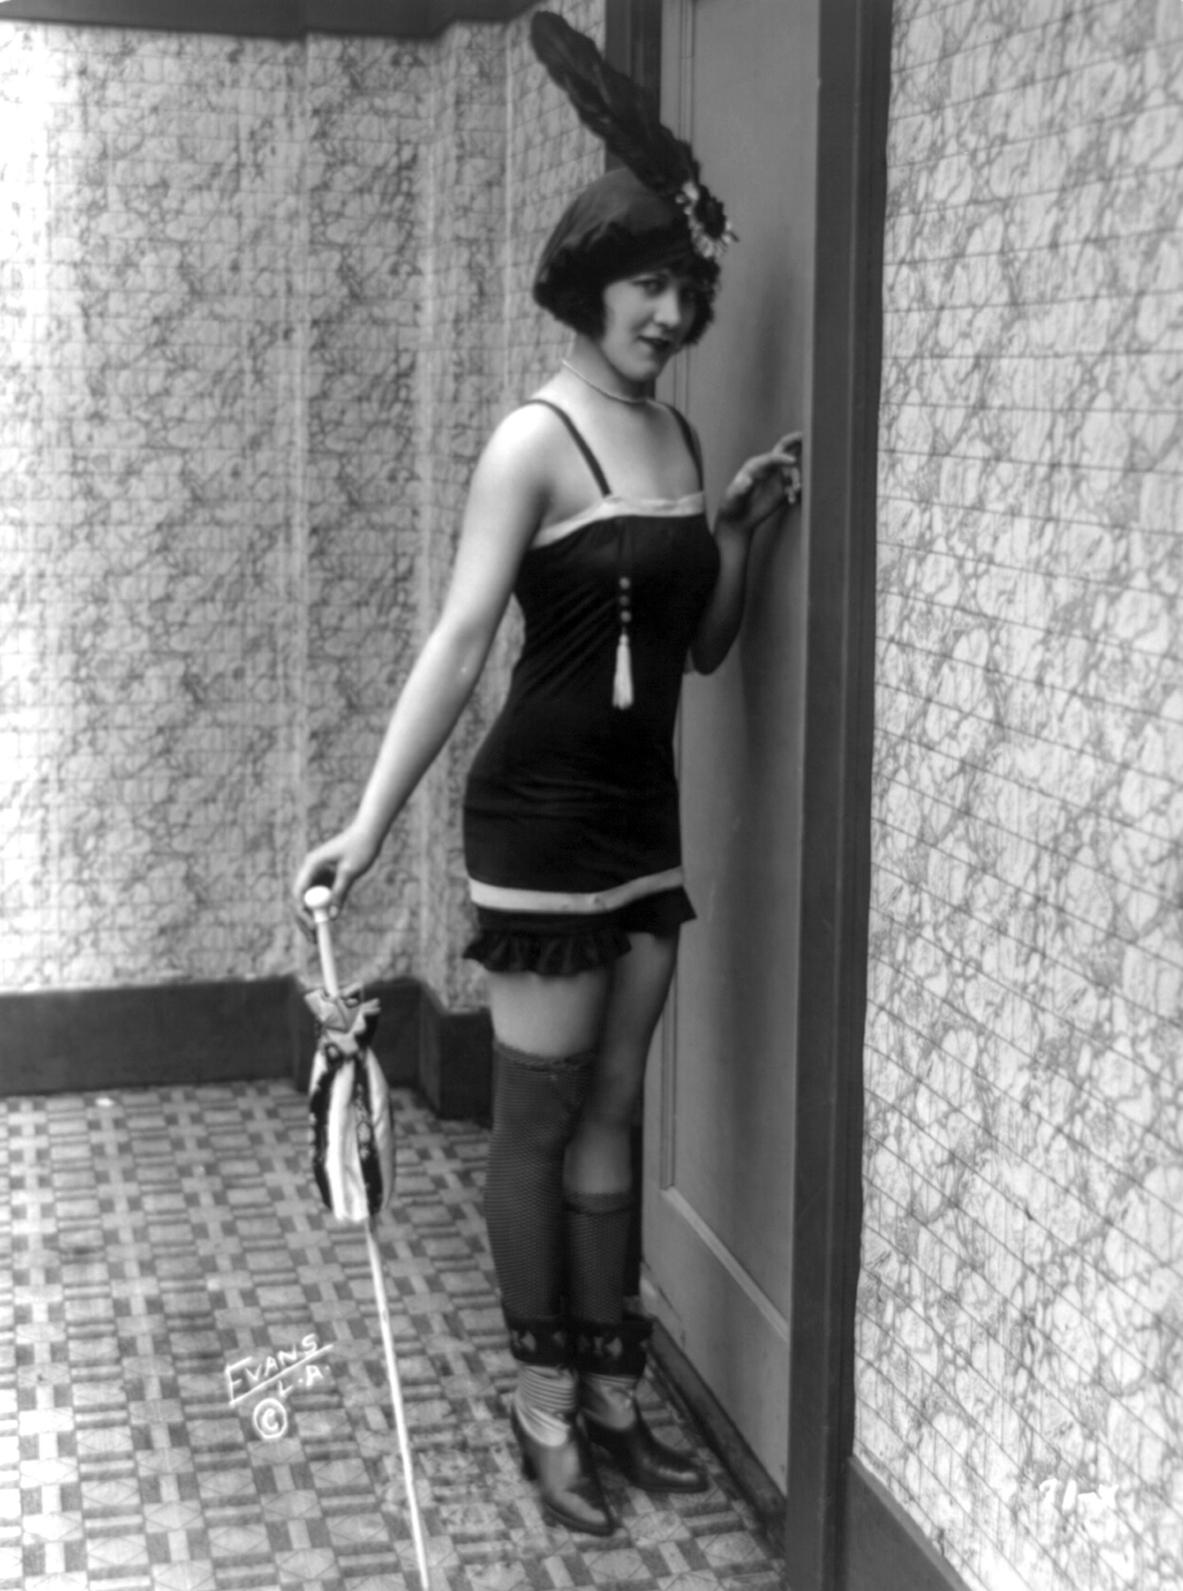 The Beauties Our Princess Diana Fashion Article For 11: Verdoux: SENNETT'S BATHING BEAUTIES (c.1919